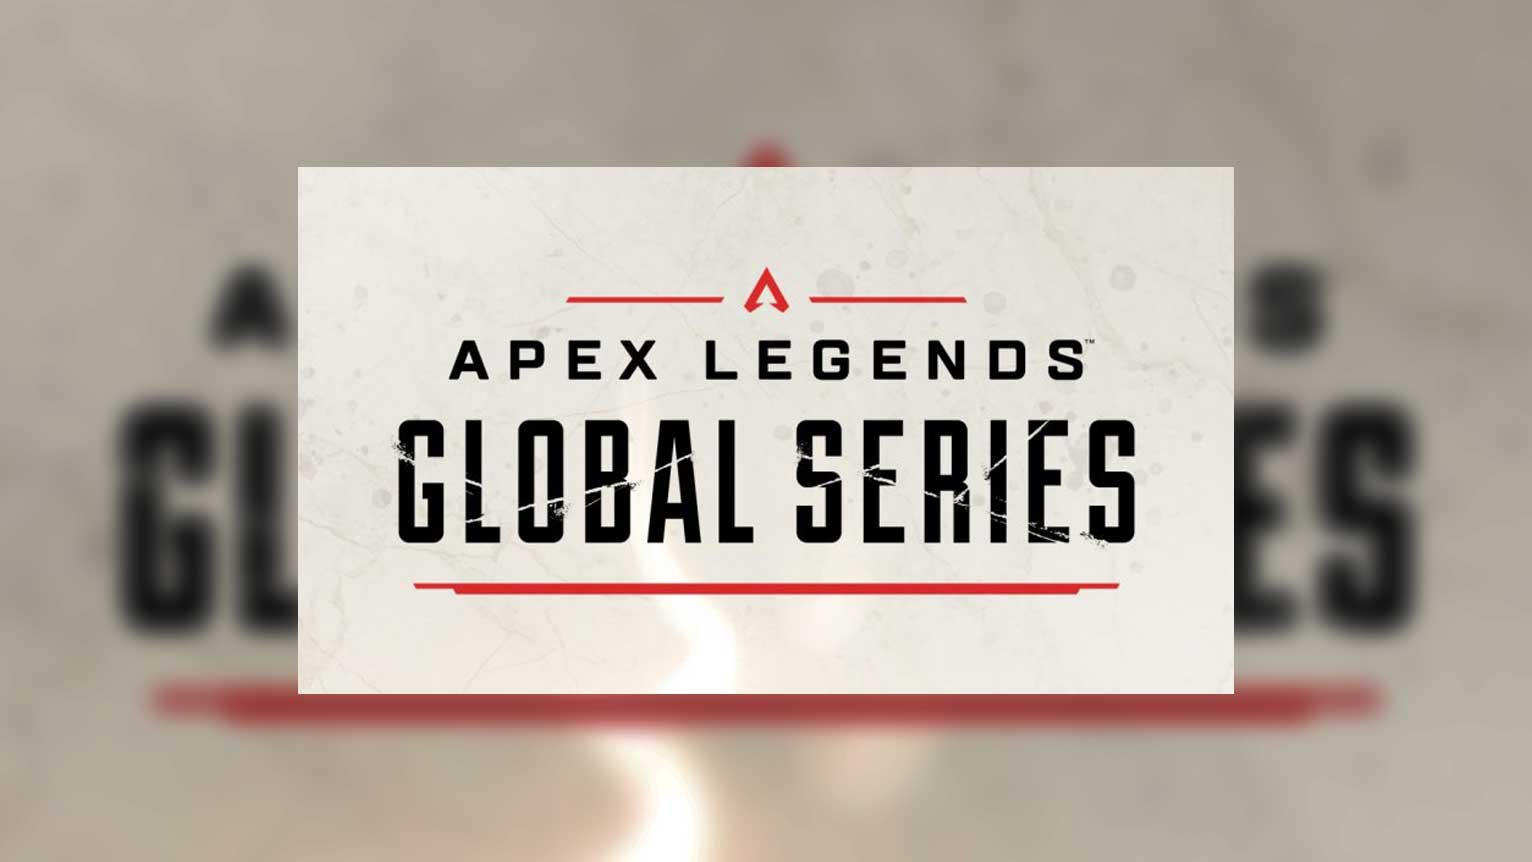 apex gs featured image annoucement blog.jpg.adapt .crop16x9.431p babt